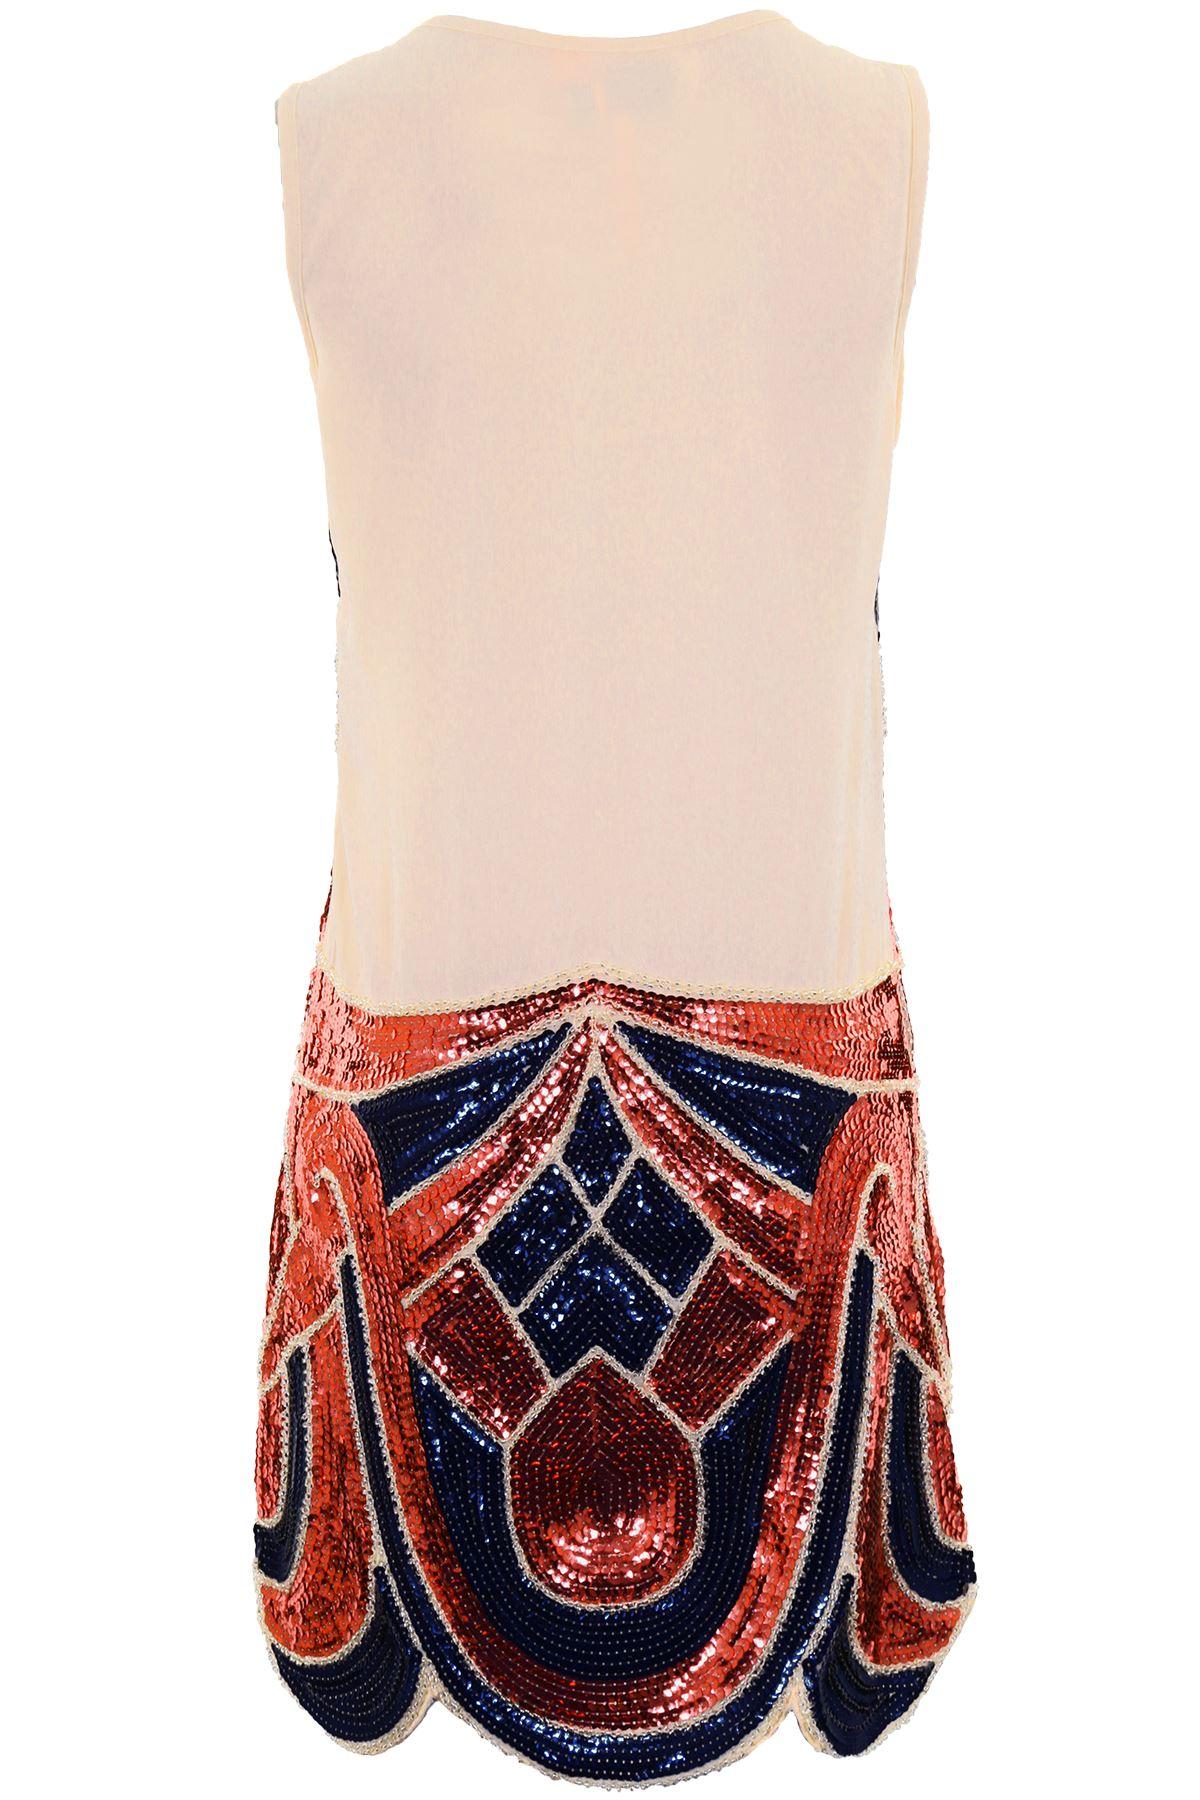 Ladies Lined Sequin Beaded Embellished Women's Scallop Hem 1920's Dress 8-14